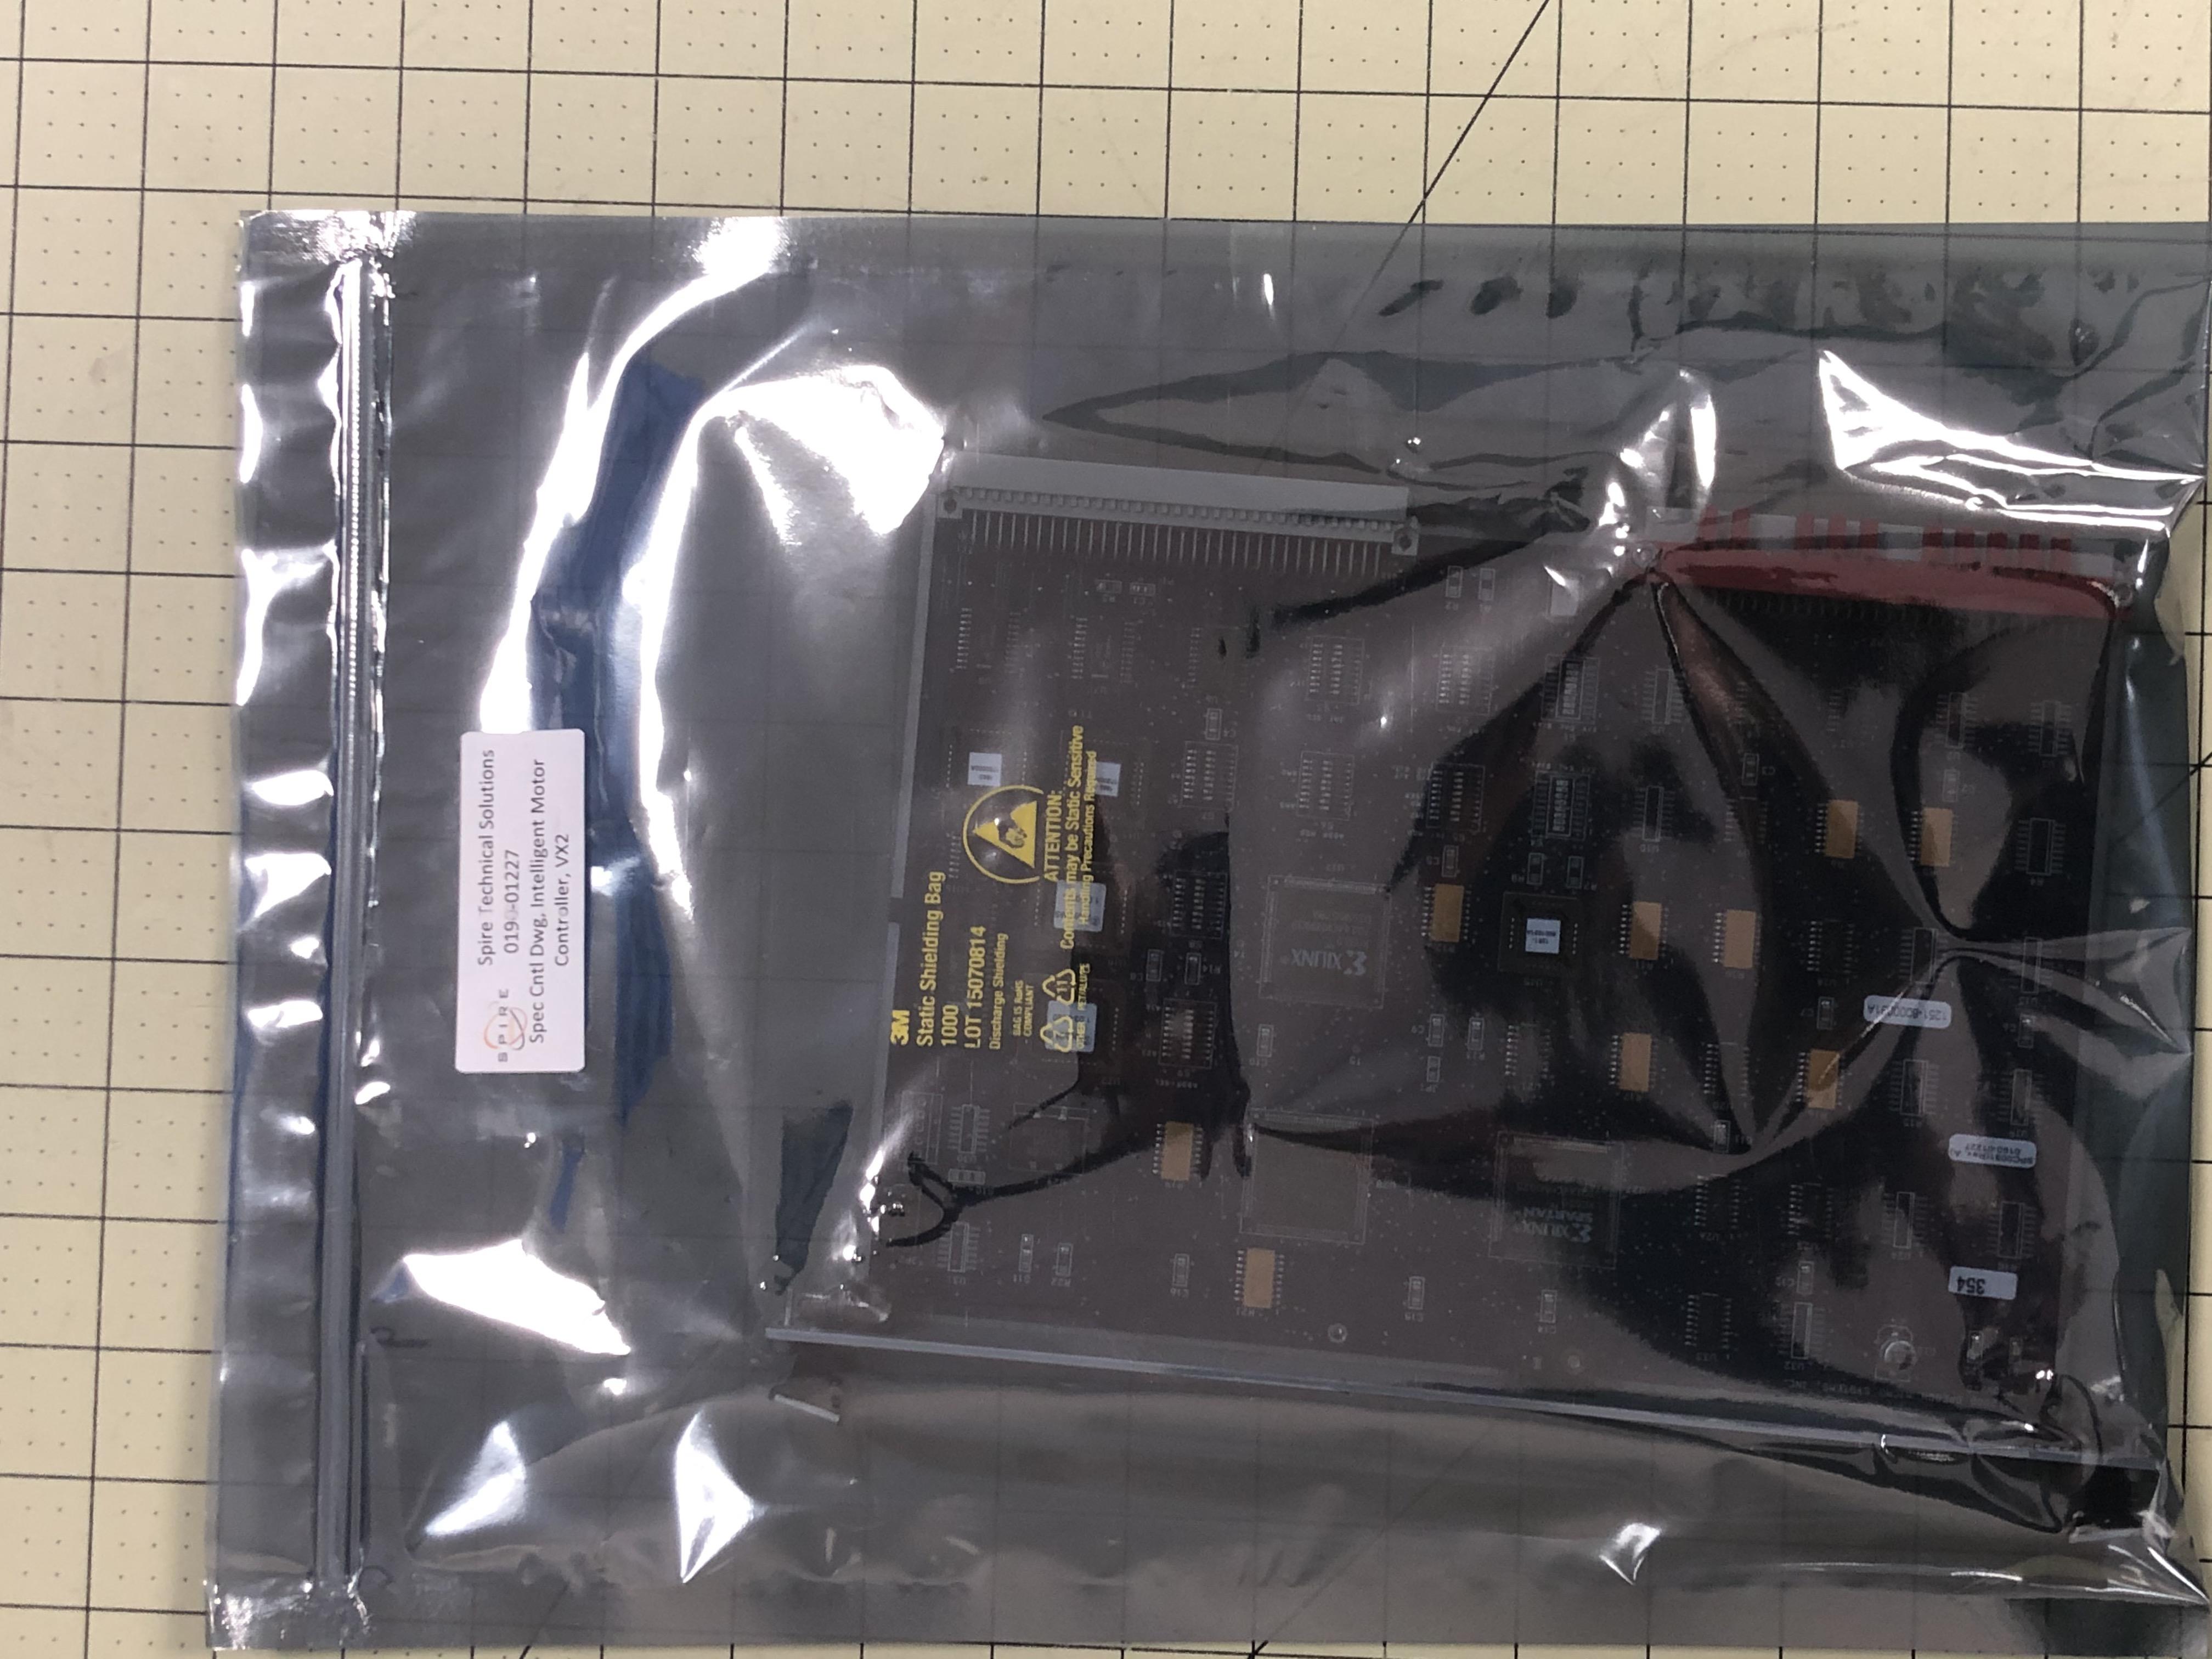 Spec Cntl Dwg, Intelligent Motor Controller, VX2